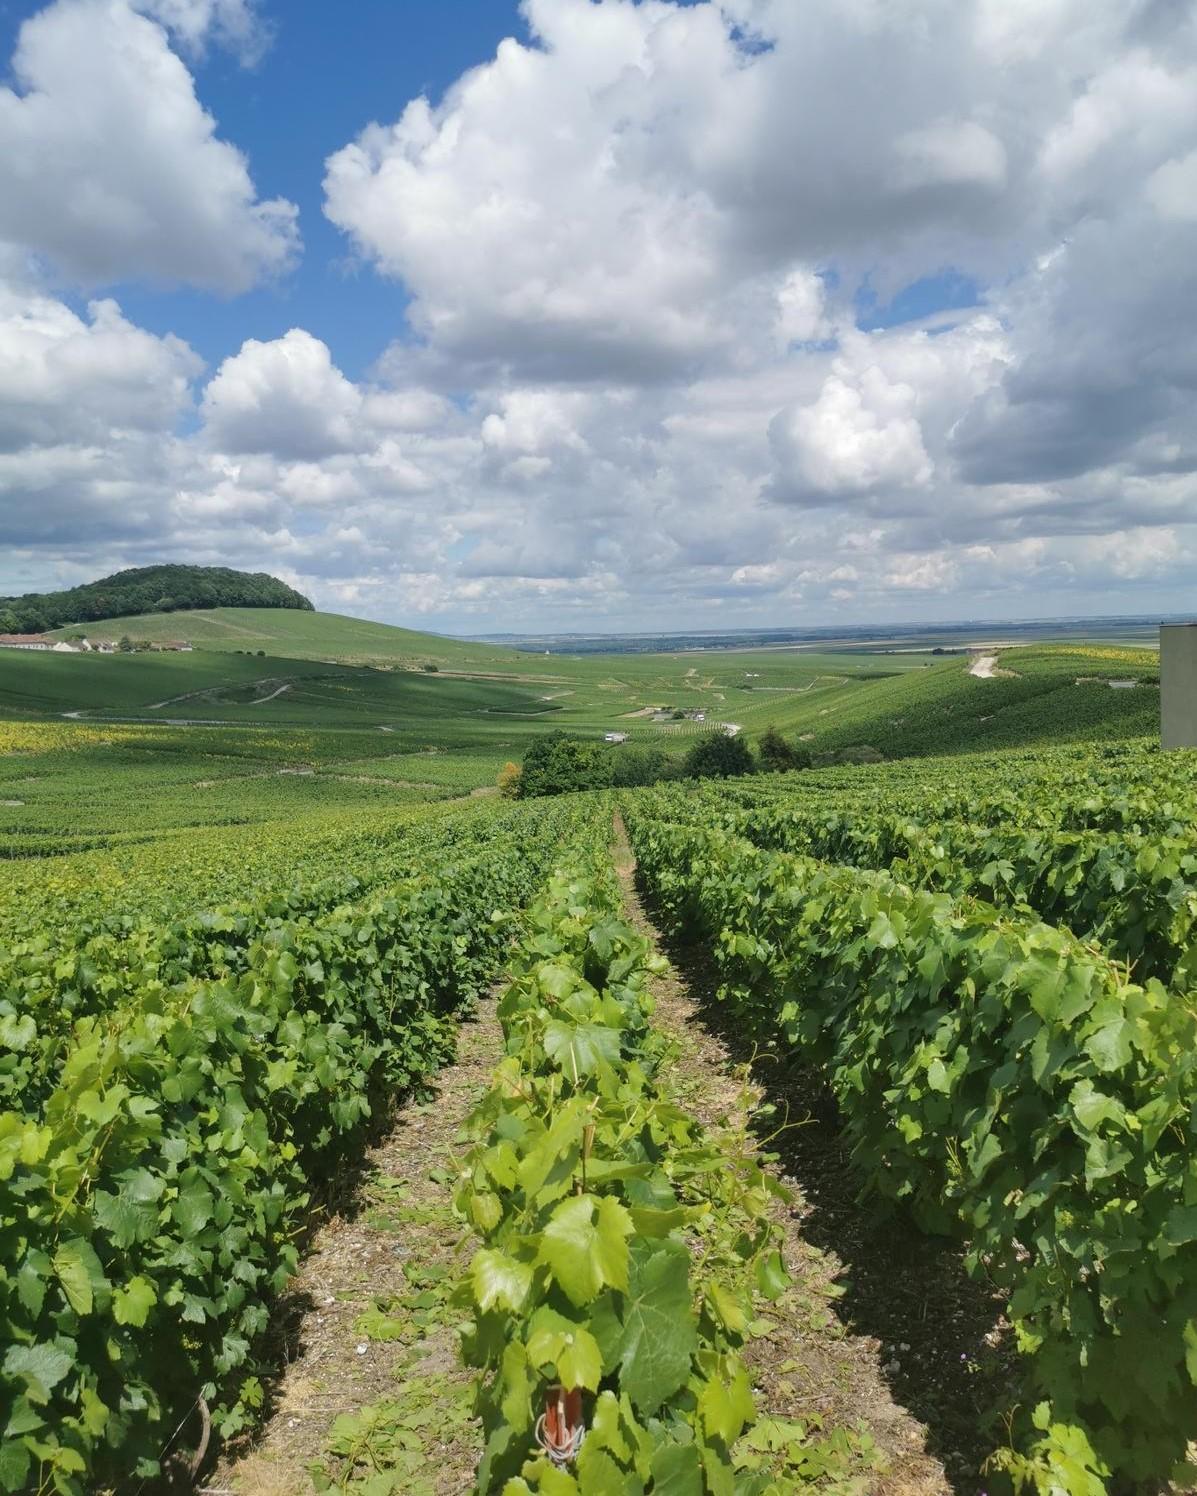 vignes_vignoble_vin_champagne